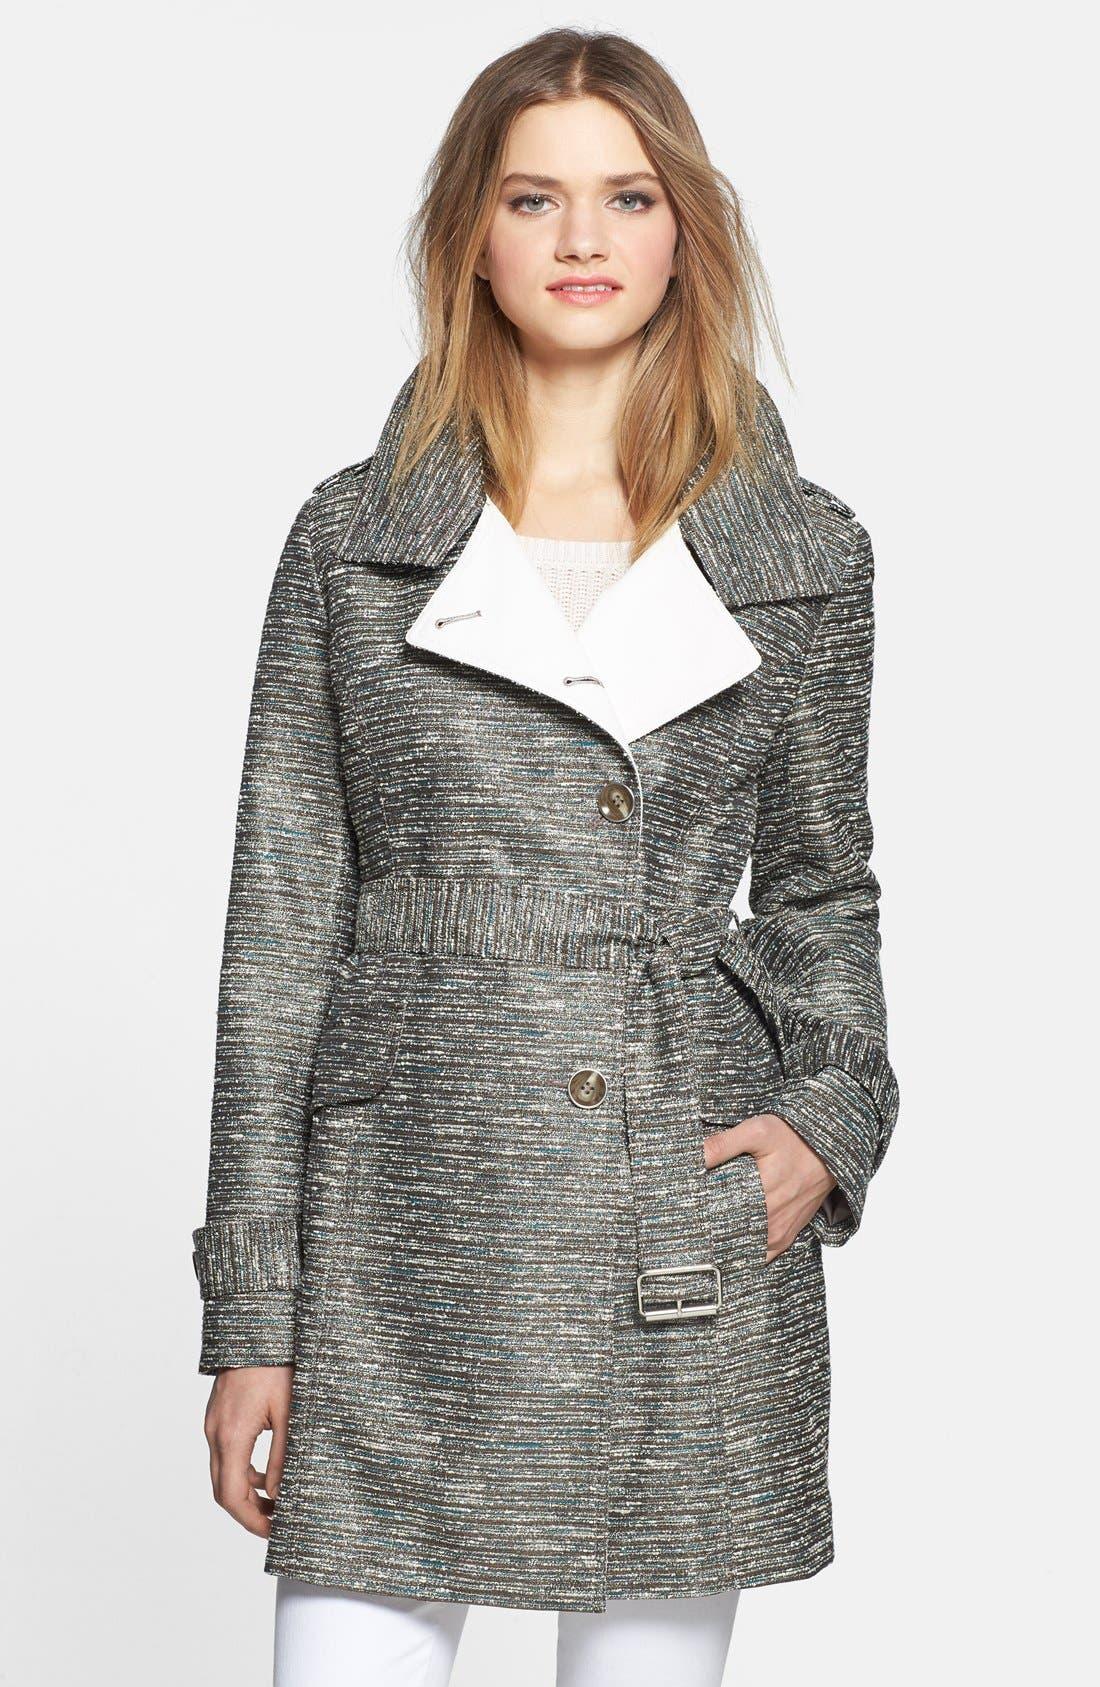 Main Image - Kenneth Cole New York Metallic Tweed Trench Coat